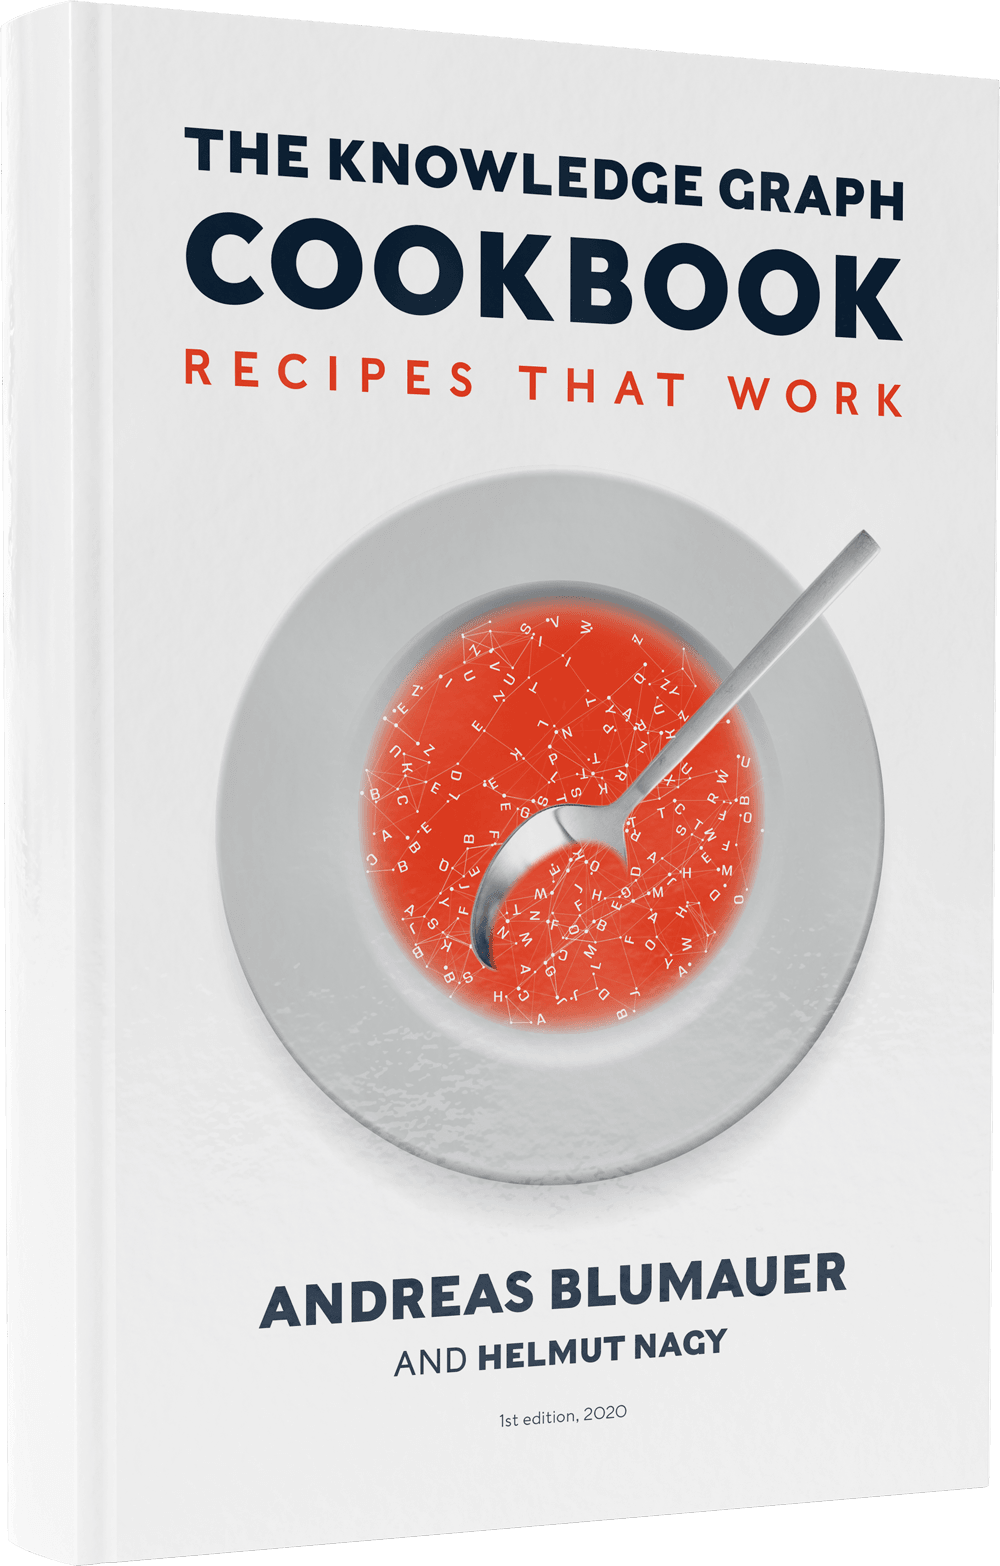 The Knowledge Graph Cookbook